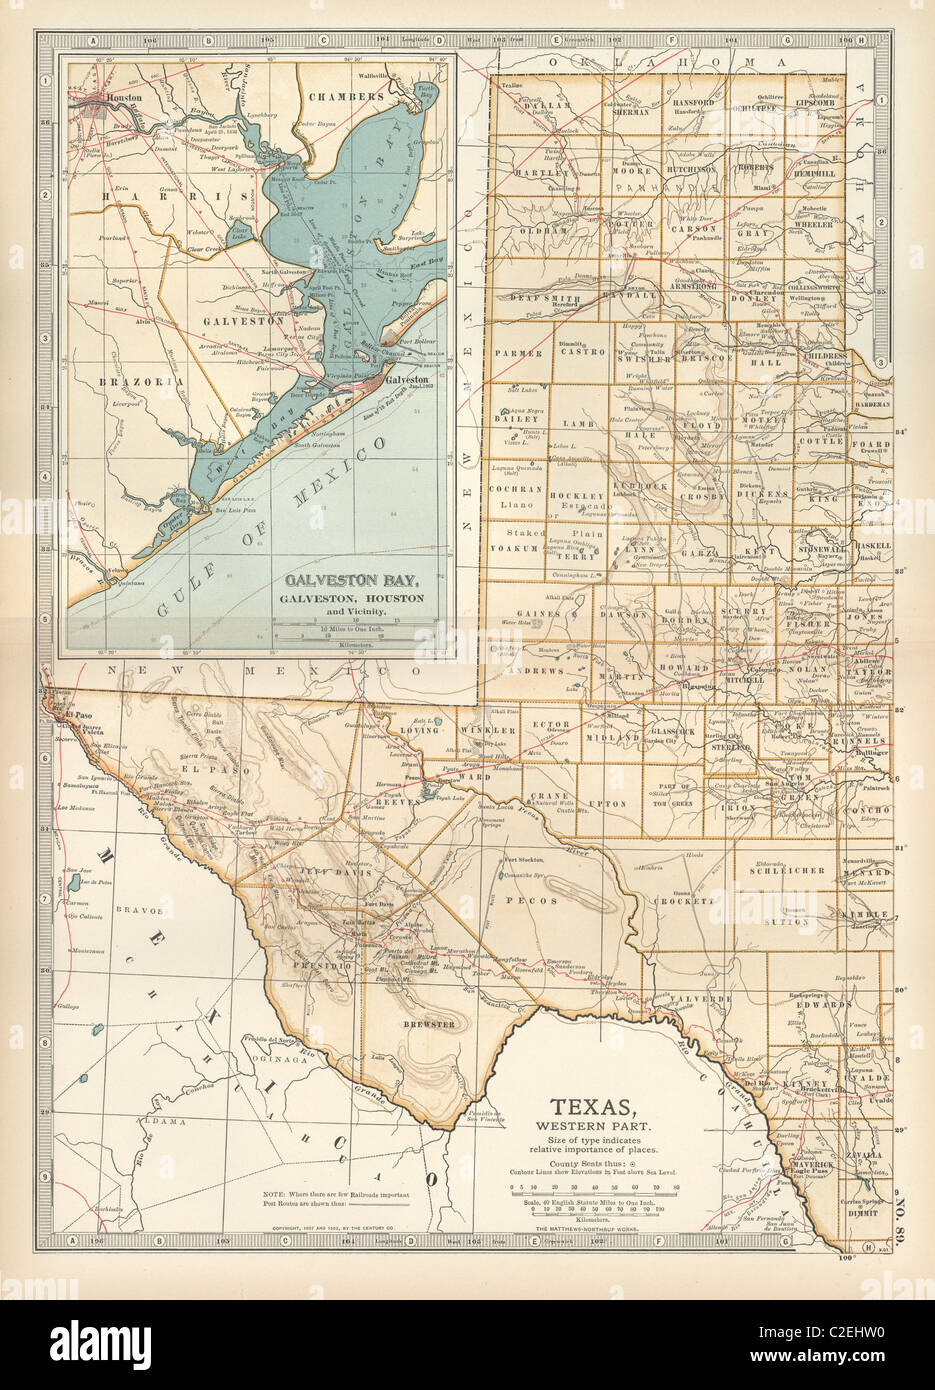 Map Of Western Texas.Map Of Western Texas With Galveston Stock Photo 35971404 Alamy